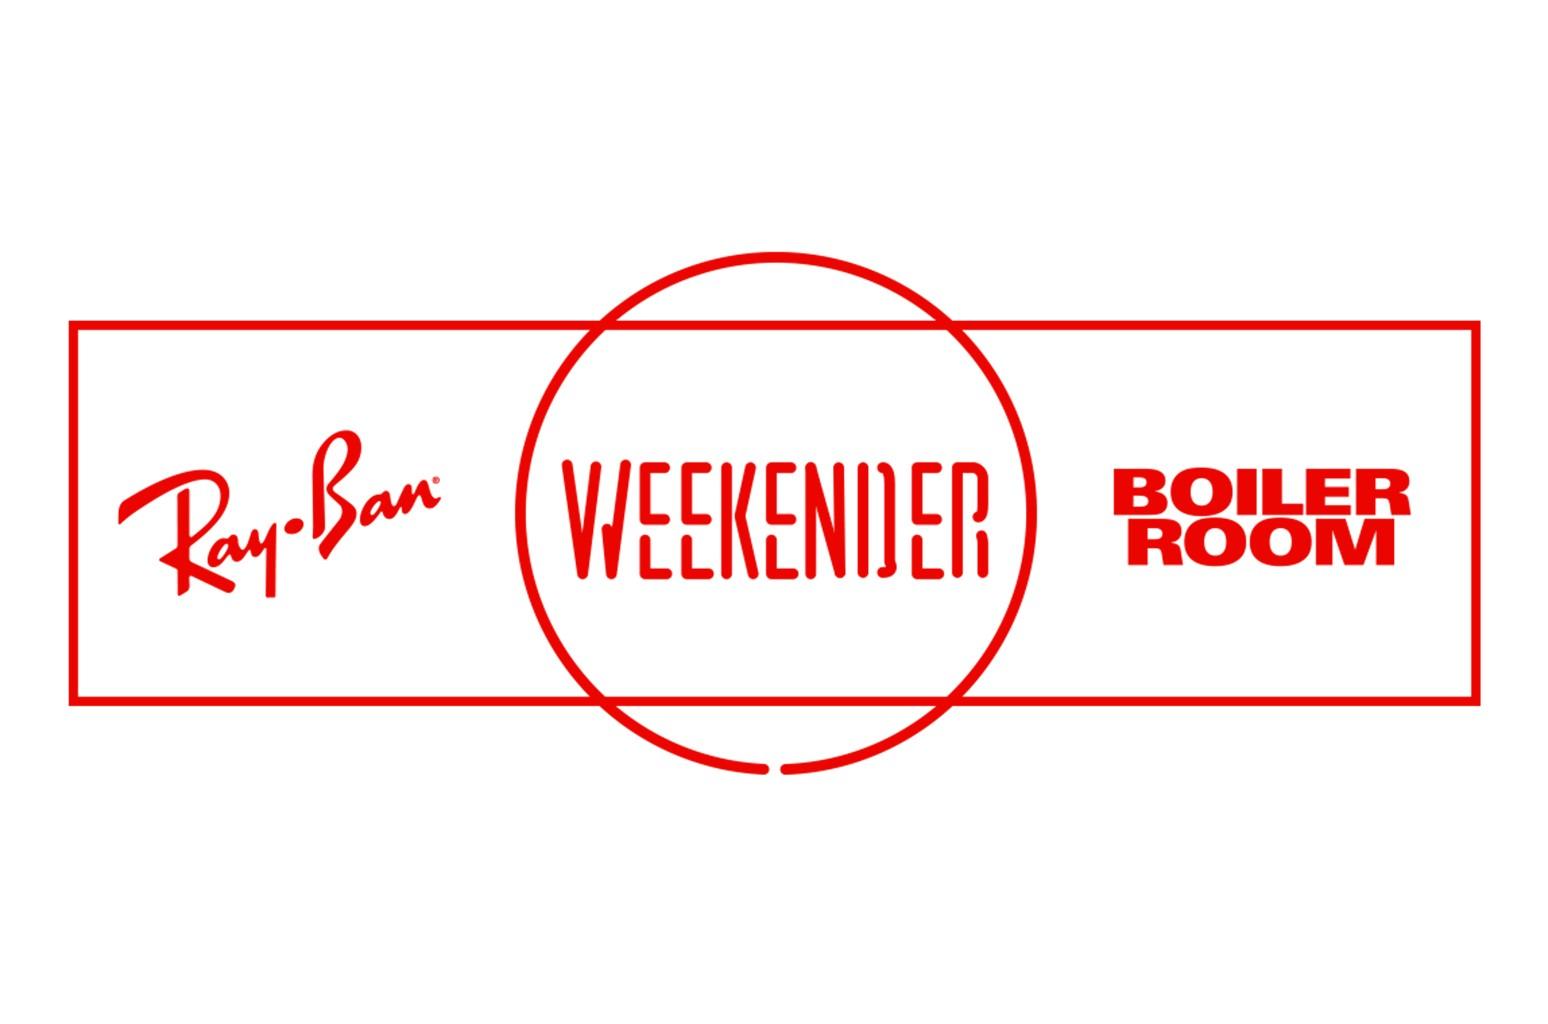 Ray Ban x Weekender x Boiler Room Logo